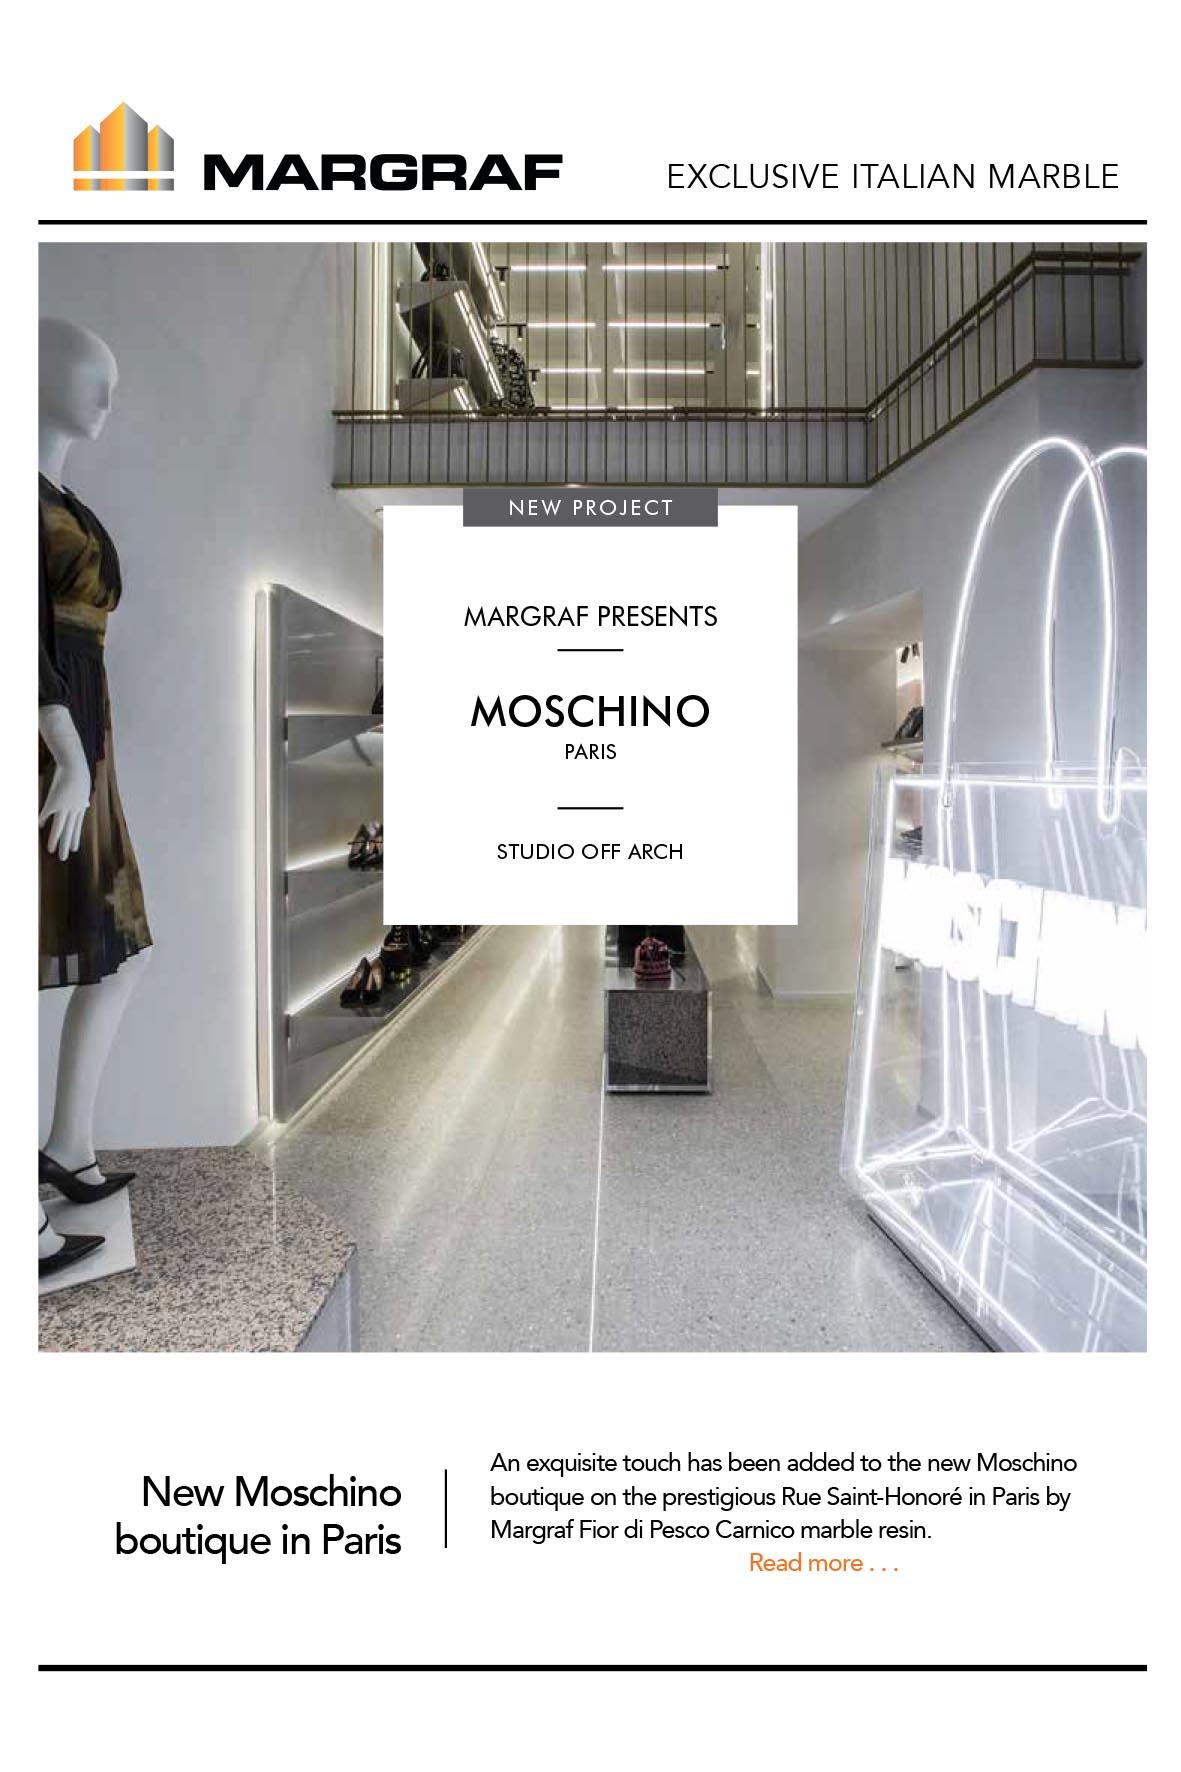 Project-Moschino-boutique-Paris-2018-1